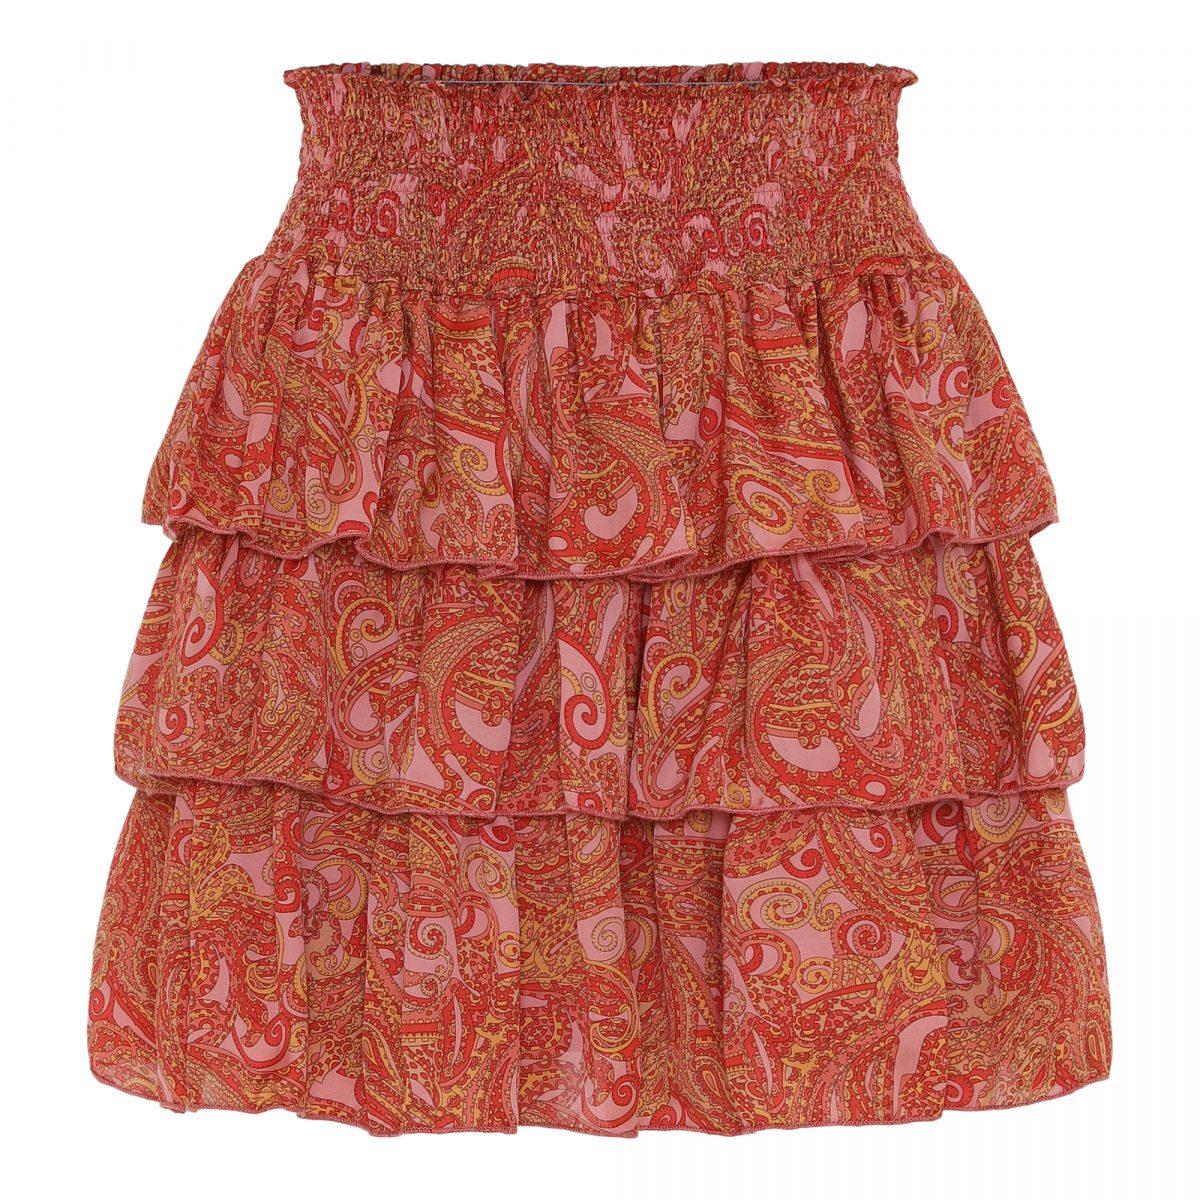 Selma-Skirt-Pink-Paisley- image by me karmamia